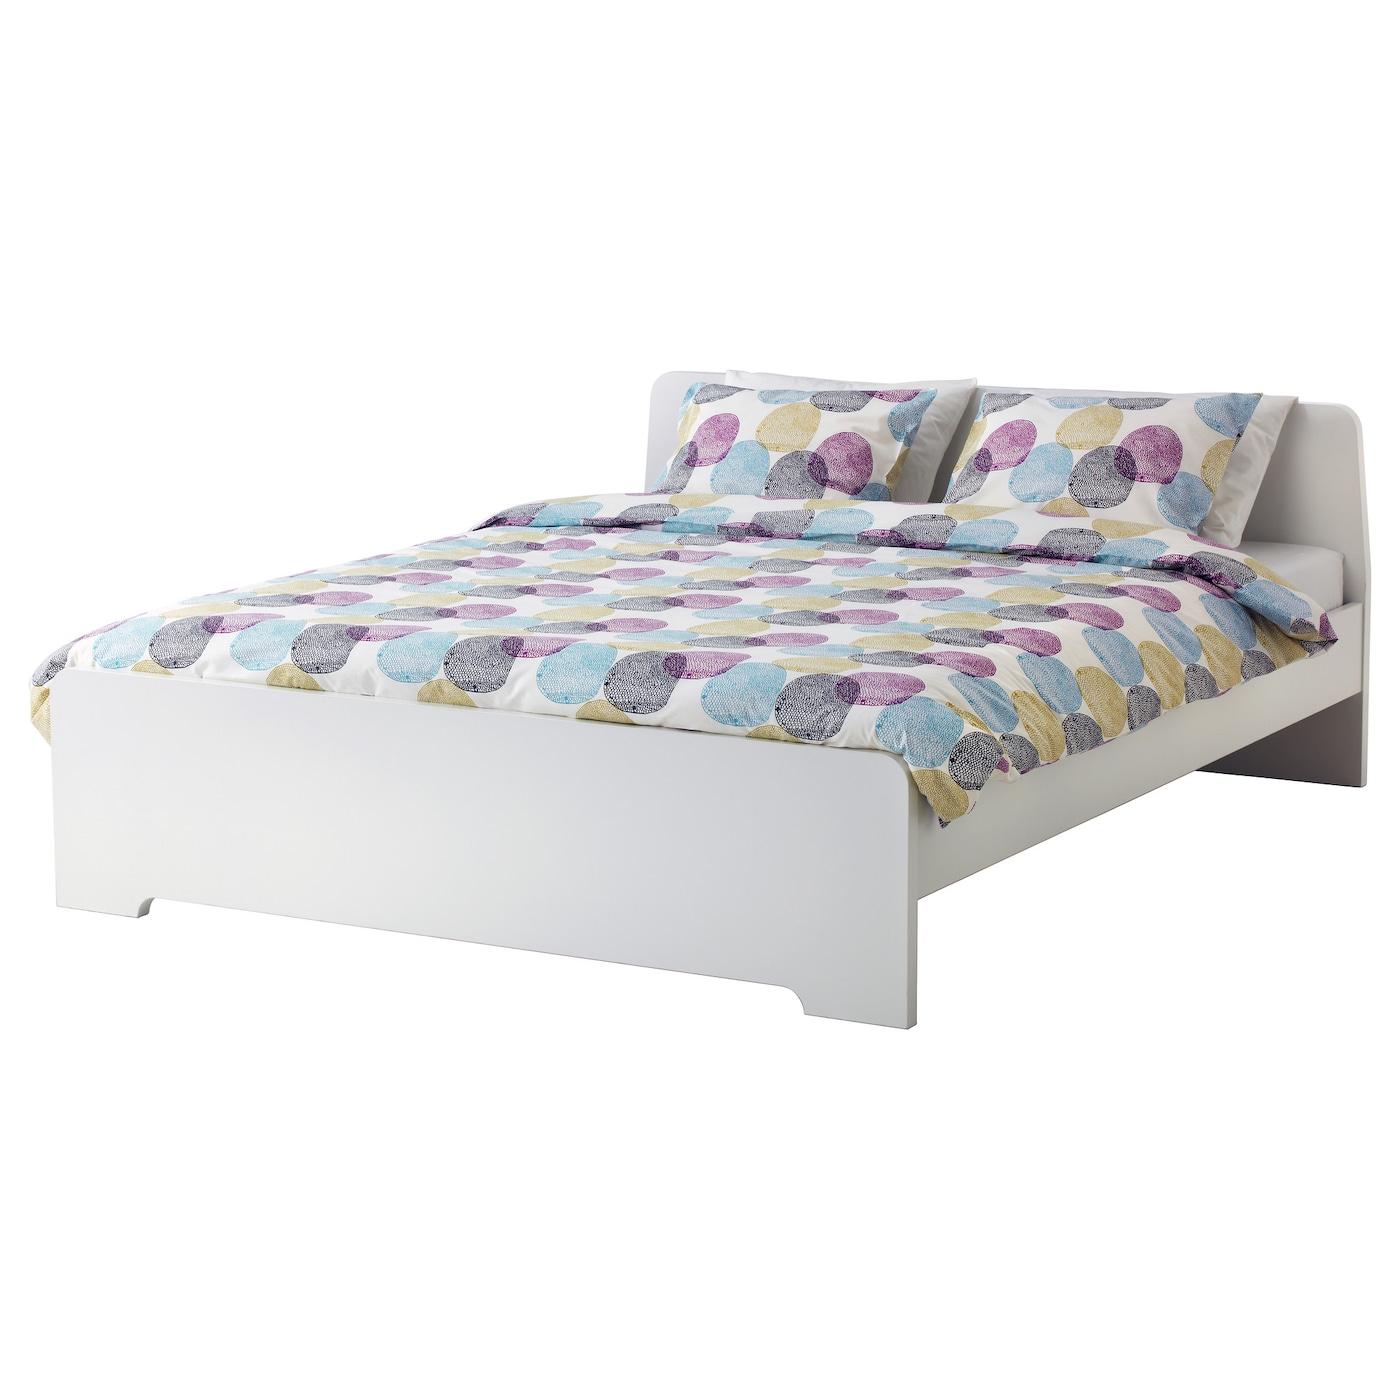 Askvoll bed frame white leirsund standard double ikea for Cadre de lit king plate forme ikea